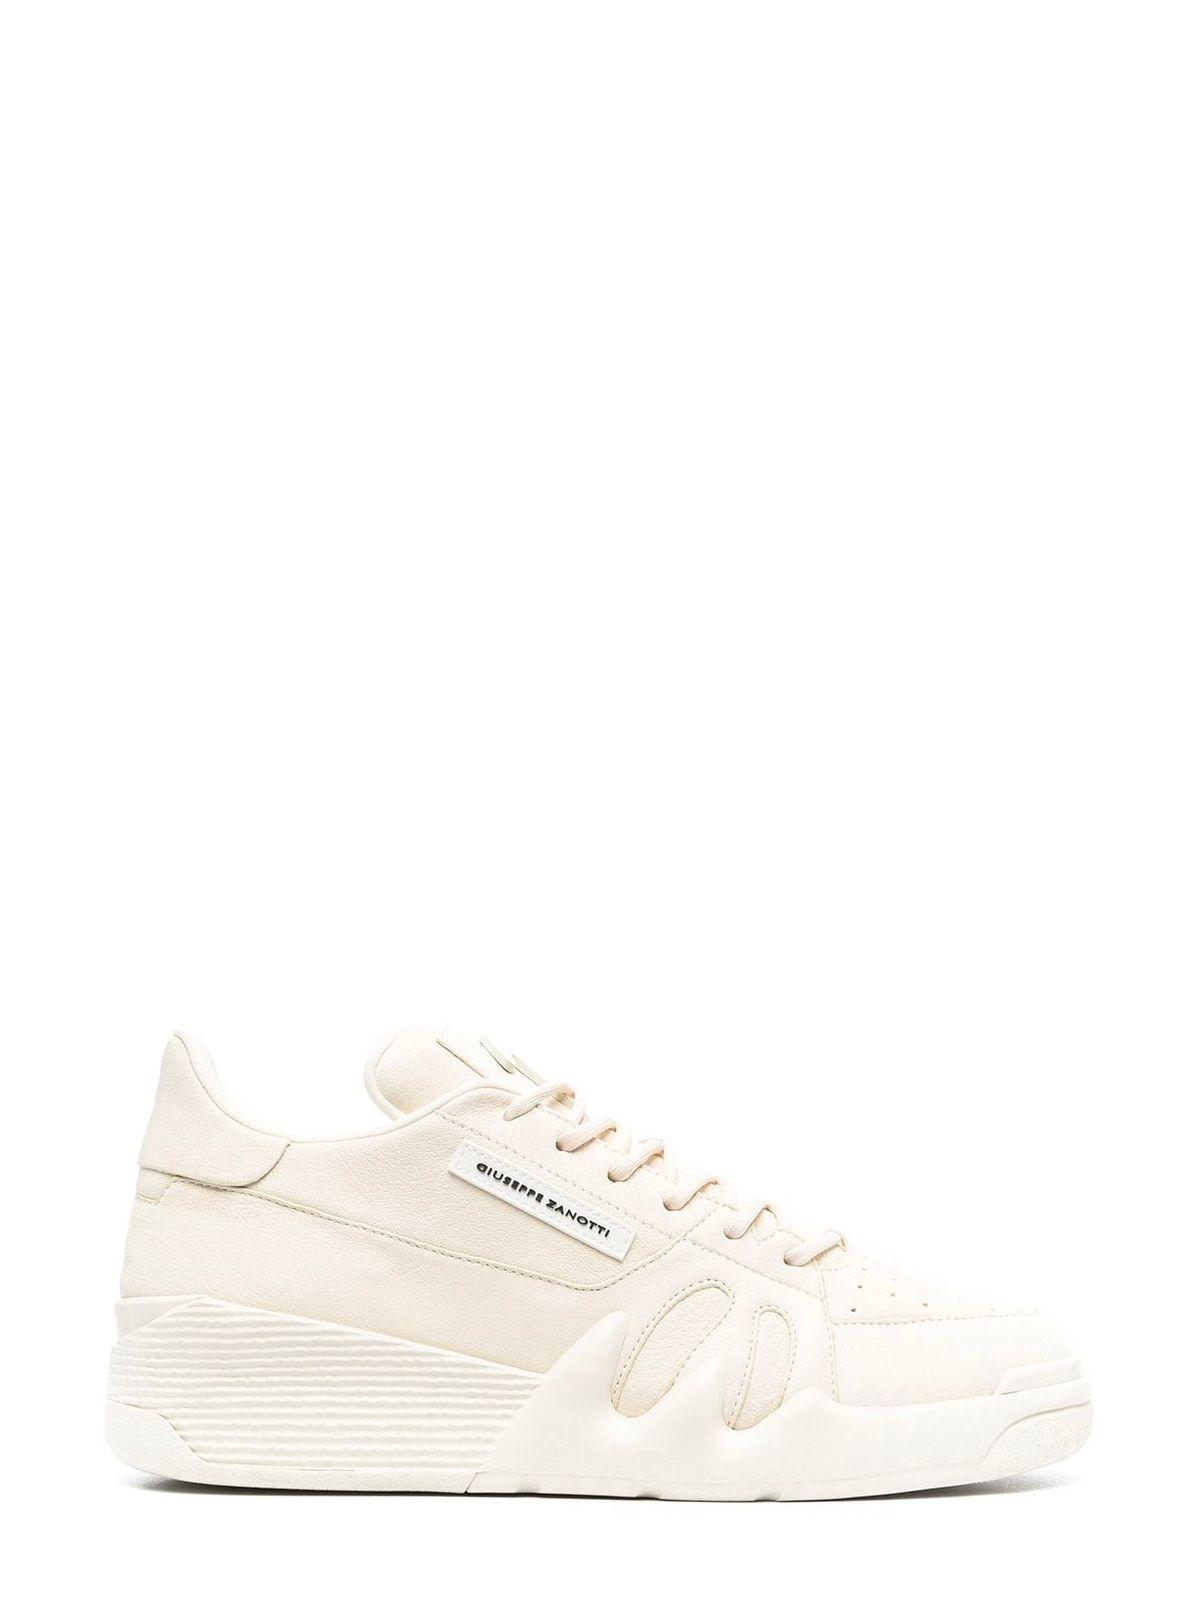 Giuseppe Zanotti Sneakers GIUSEPPE ZANOTTI DESIGN MEN'S BEIGE LEATHER SNEAKERS